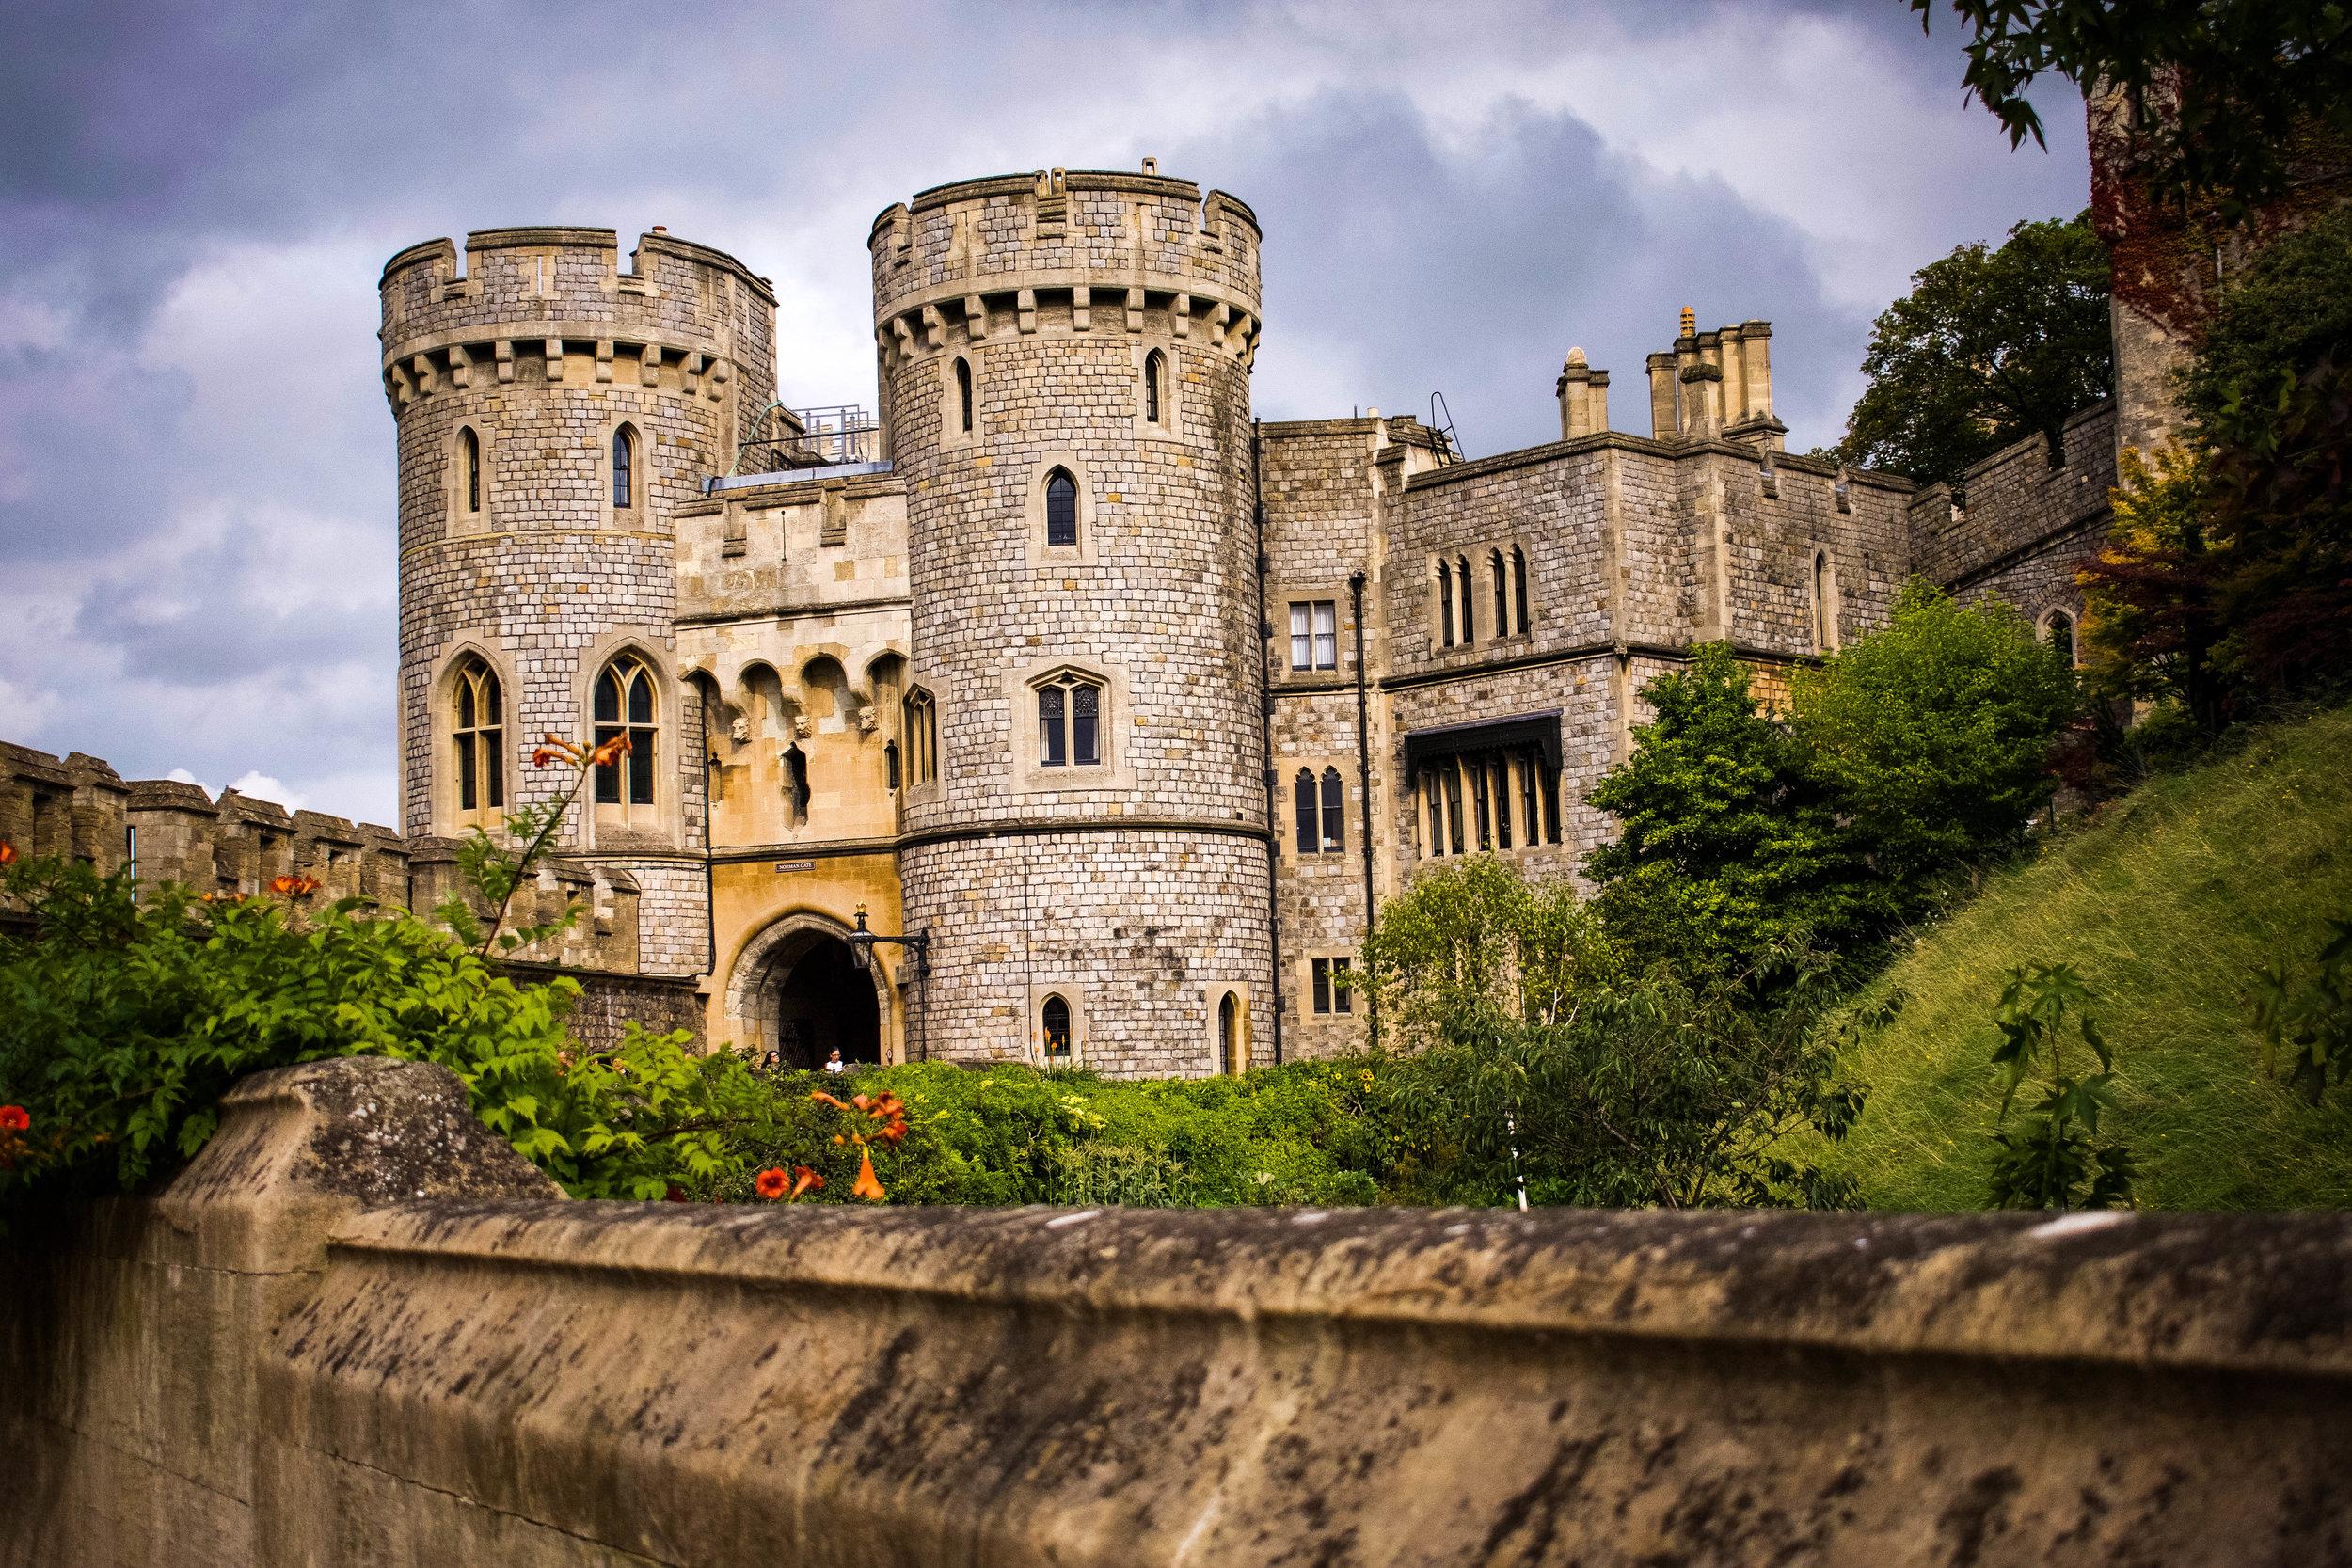 6. Windsor Castle -